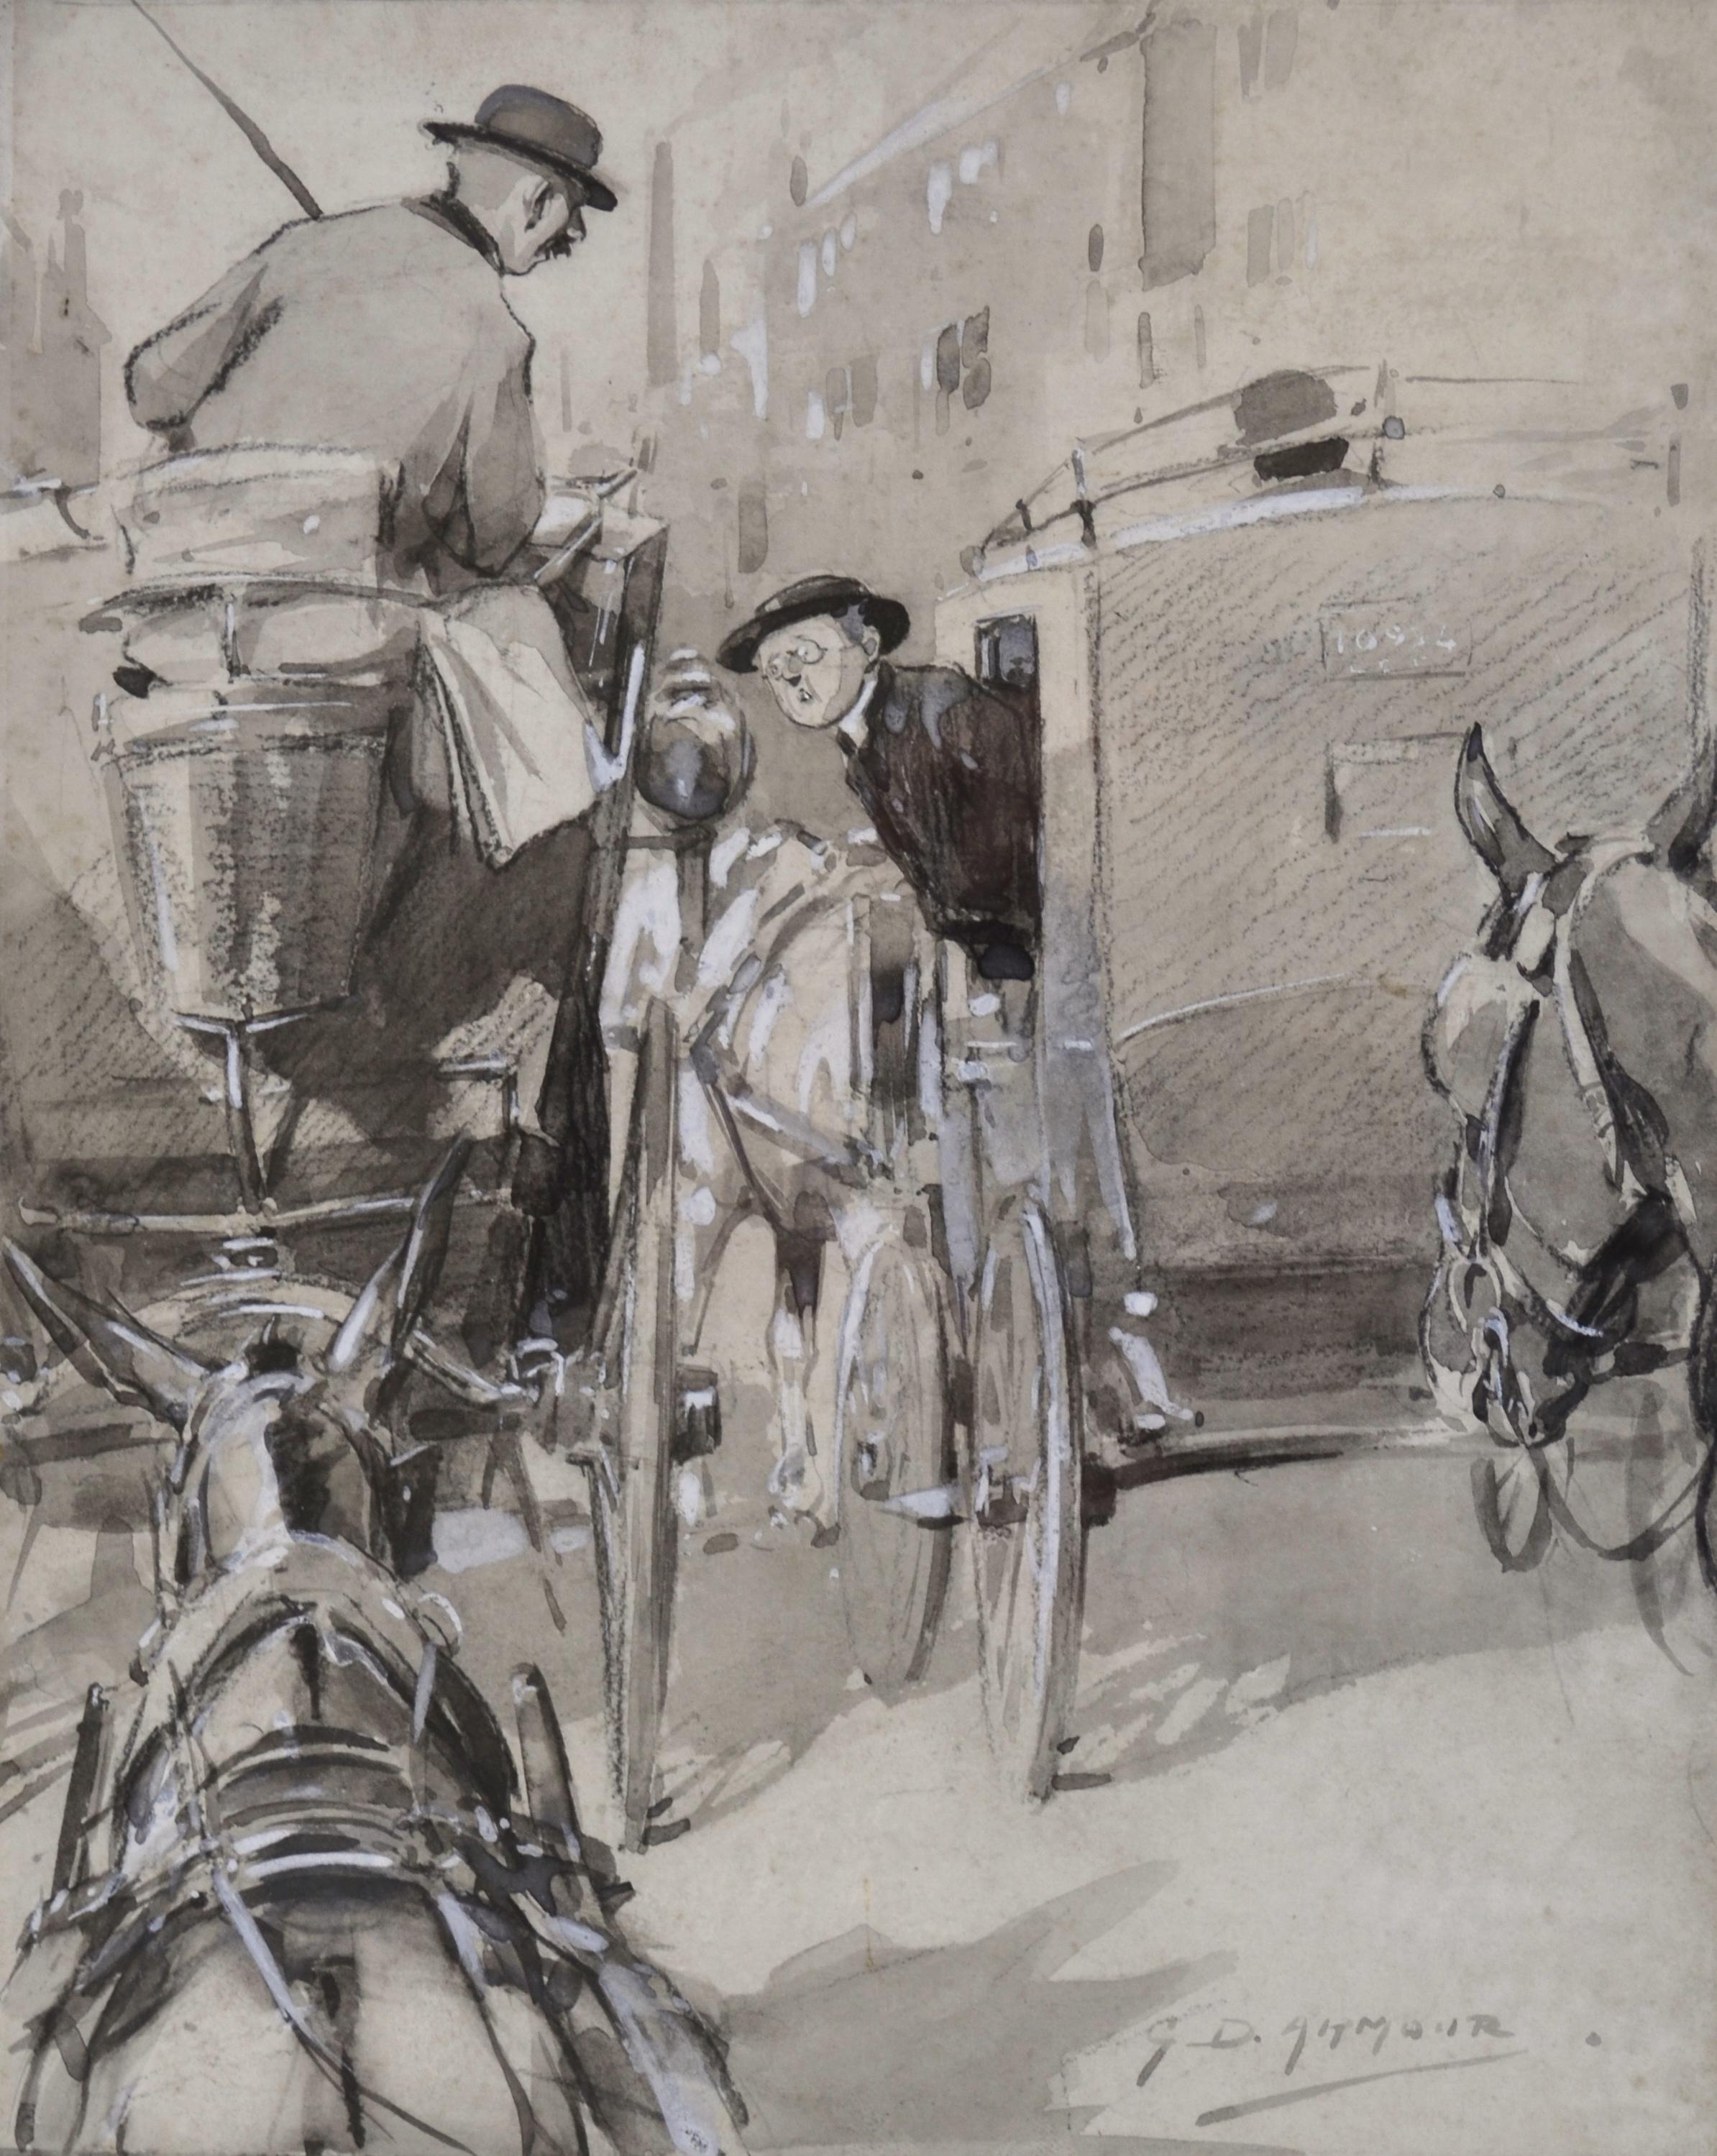 London Cabman - 19th Century British illustration by equestrian artist Armour